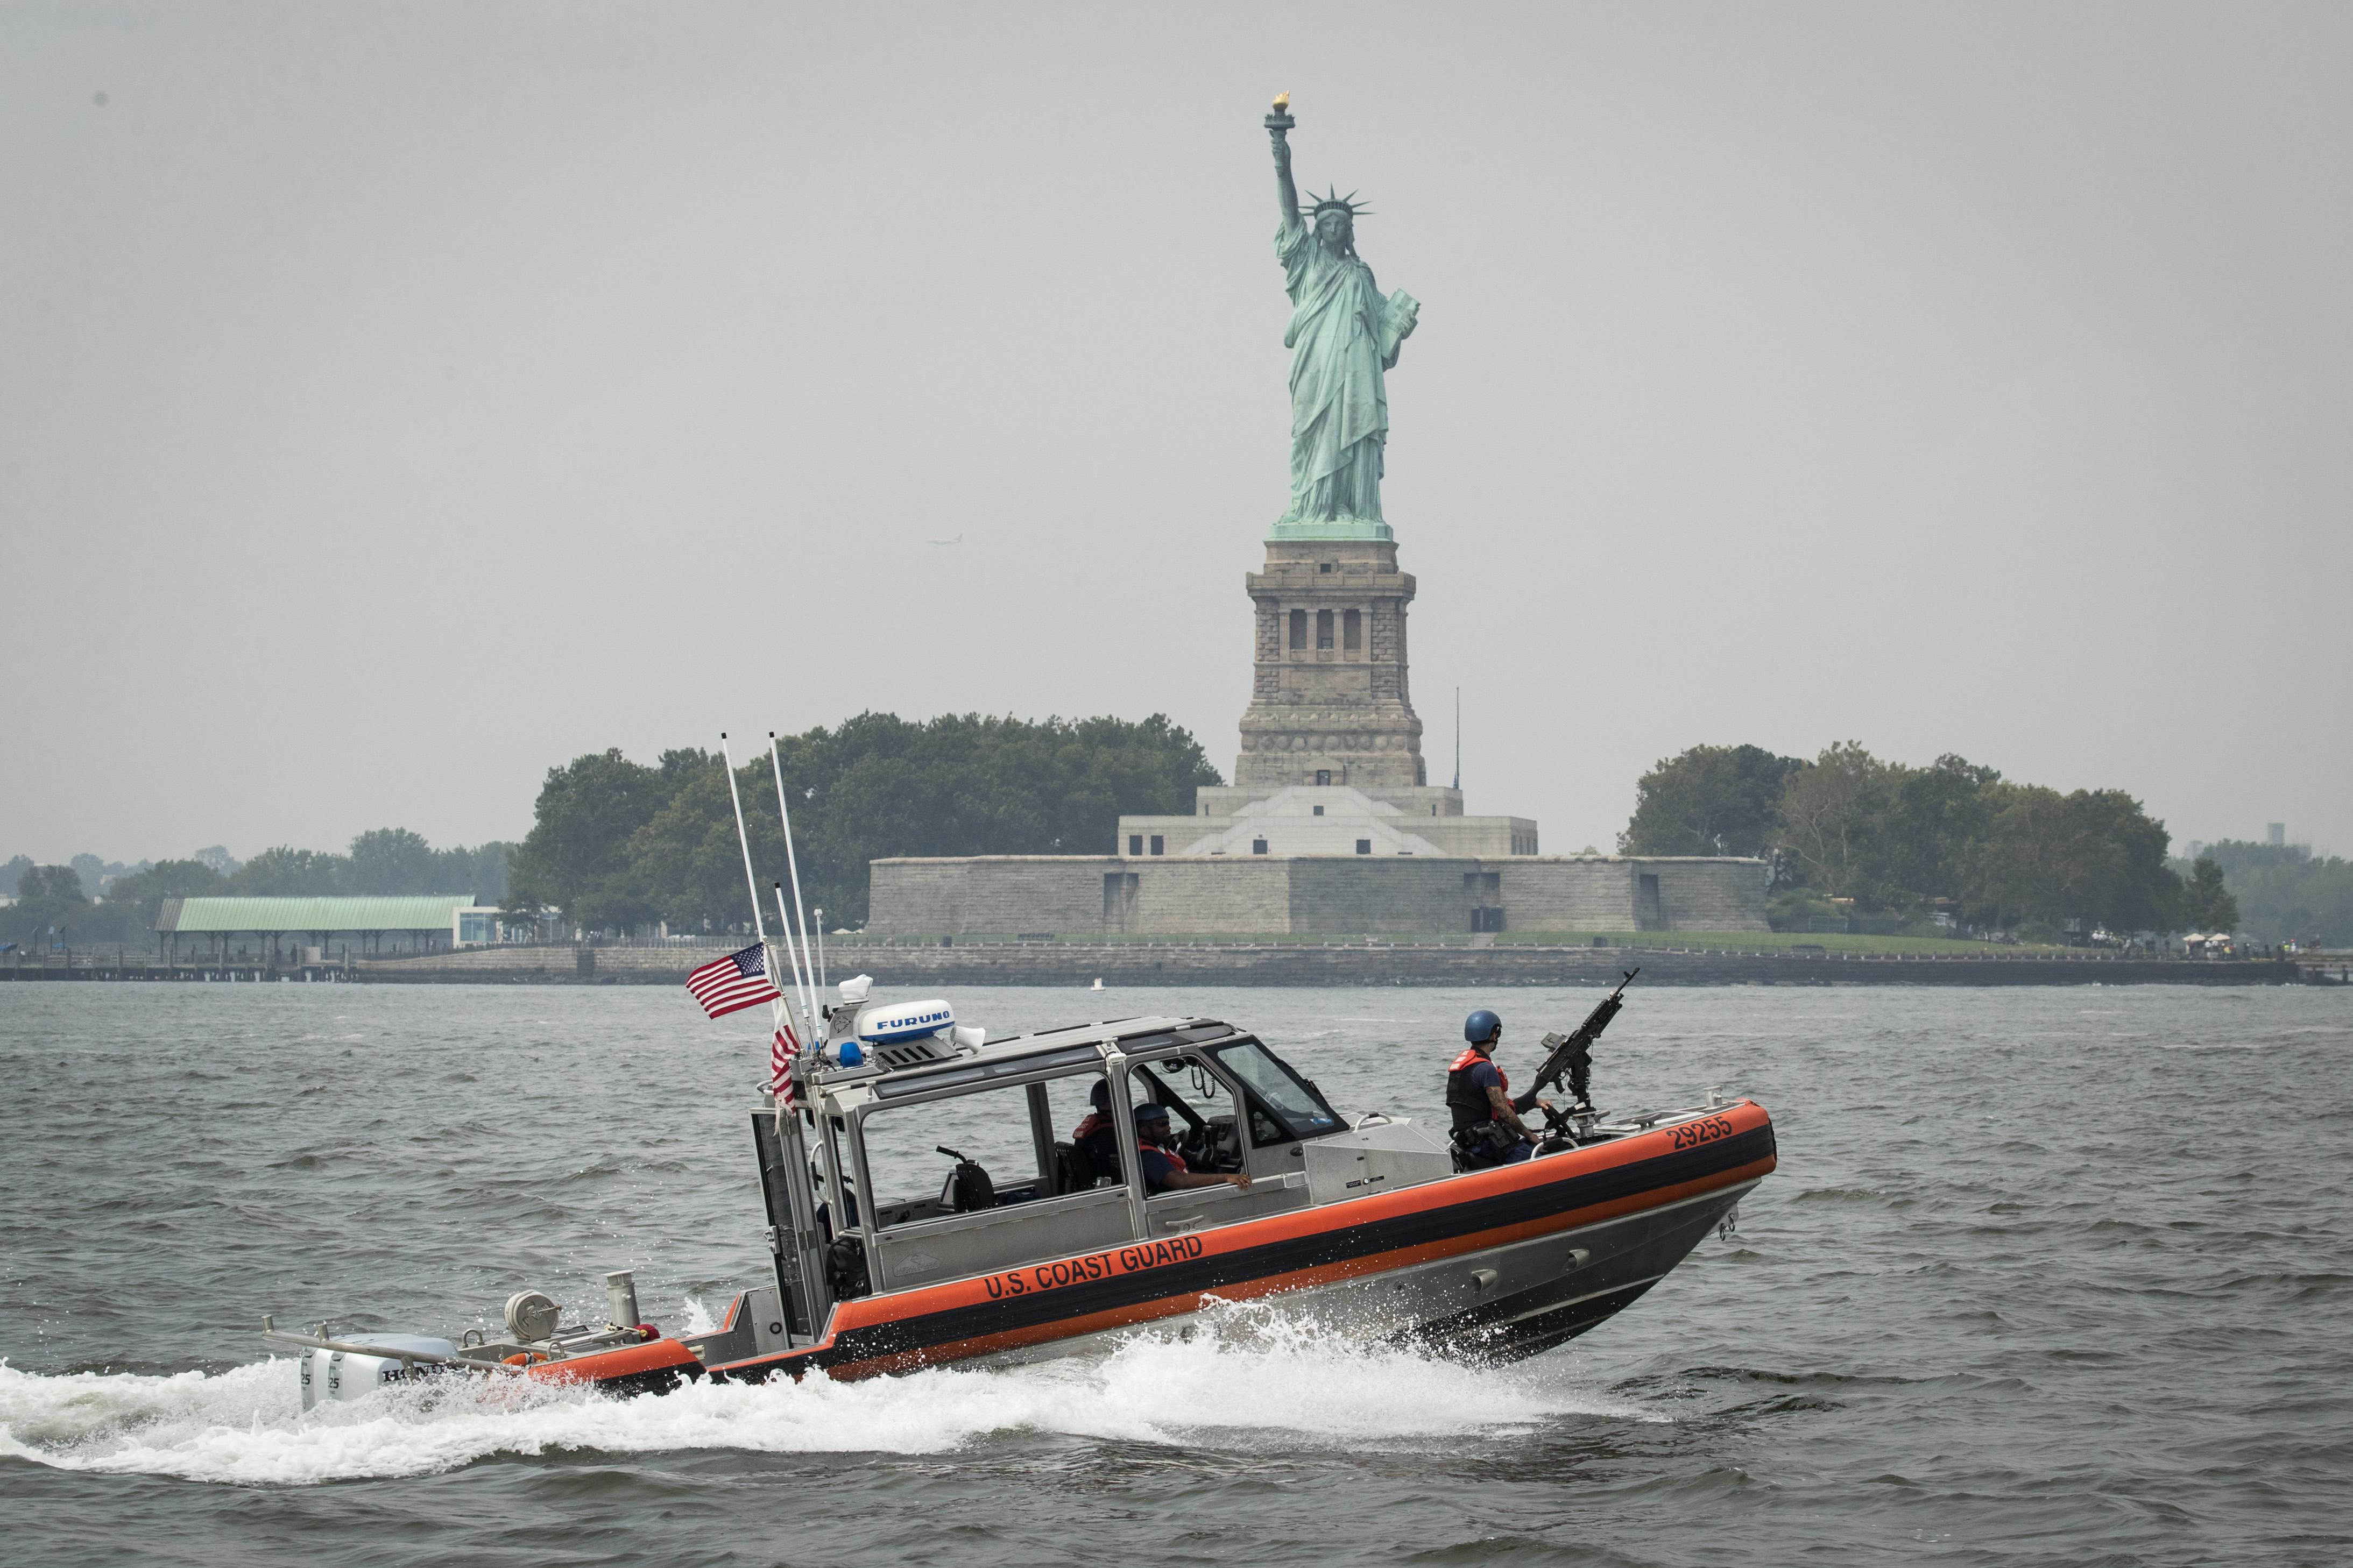 A U.S. Coast Guard boat cruises through New York Harbor near the Statue of Liberty, Aug. 27, 2018.